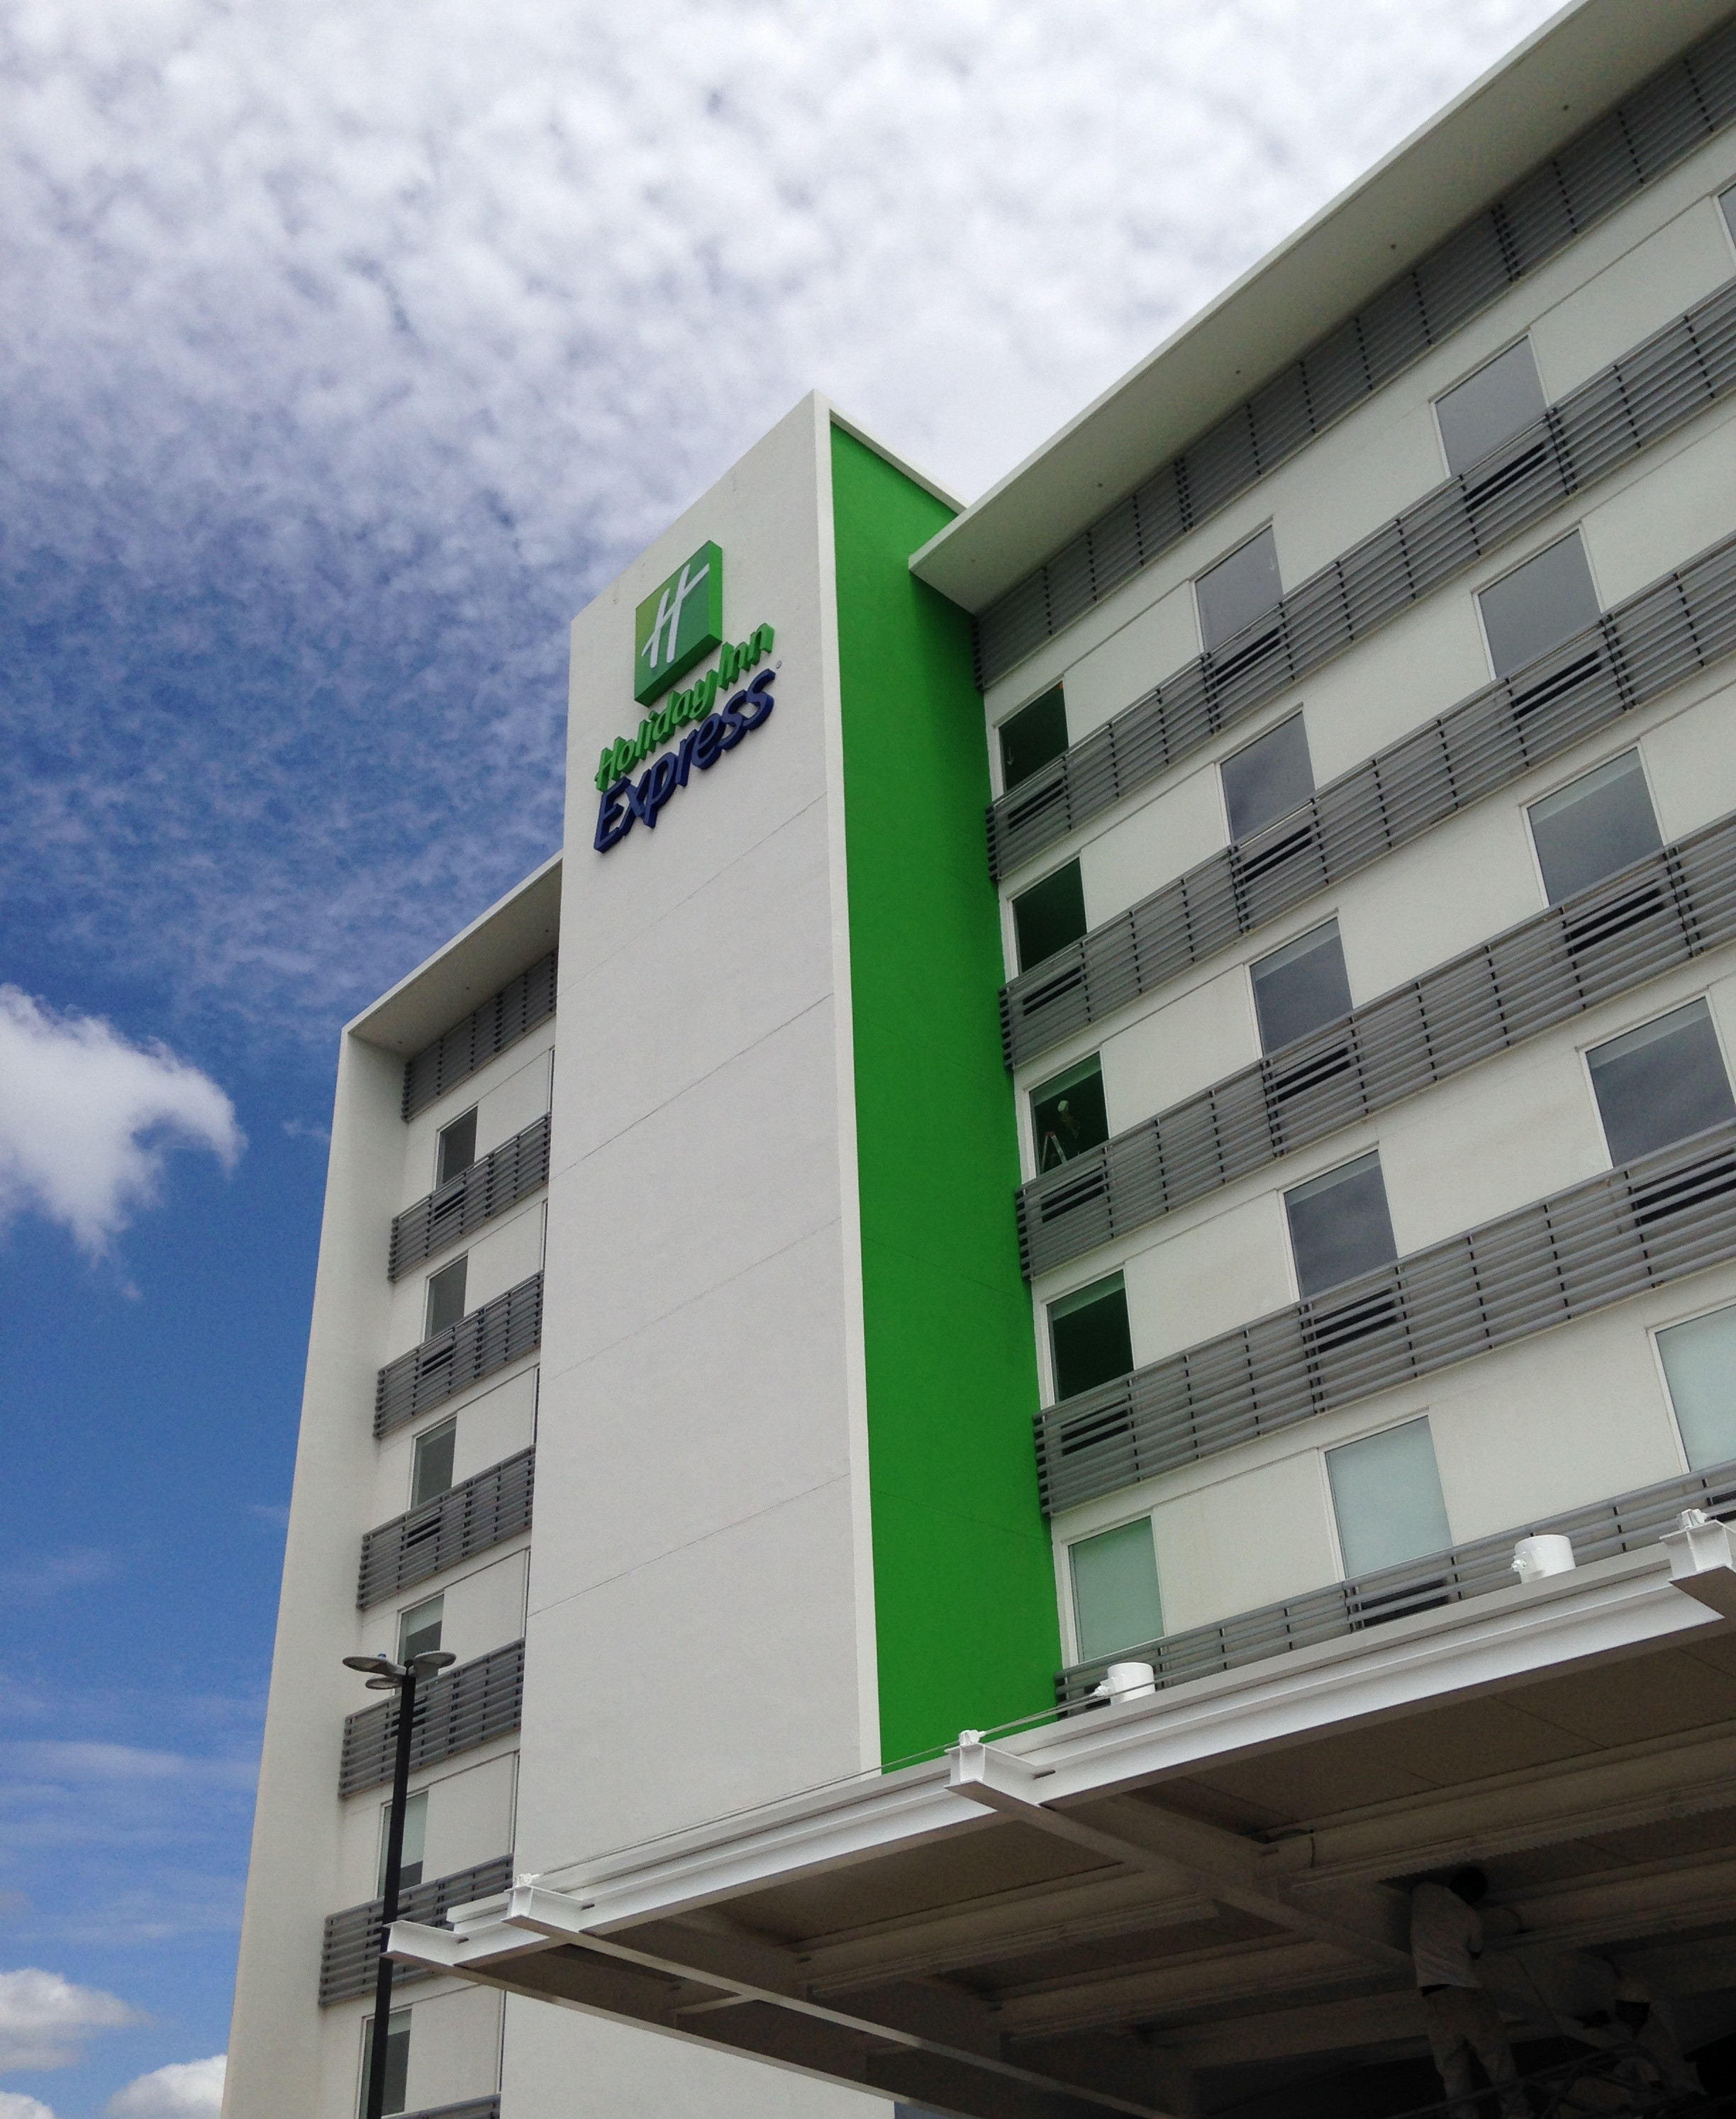 Ihg Announces Holiday Inn Express Hotel Managua